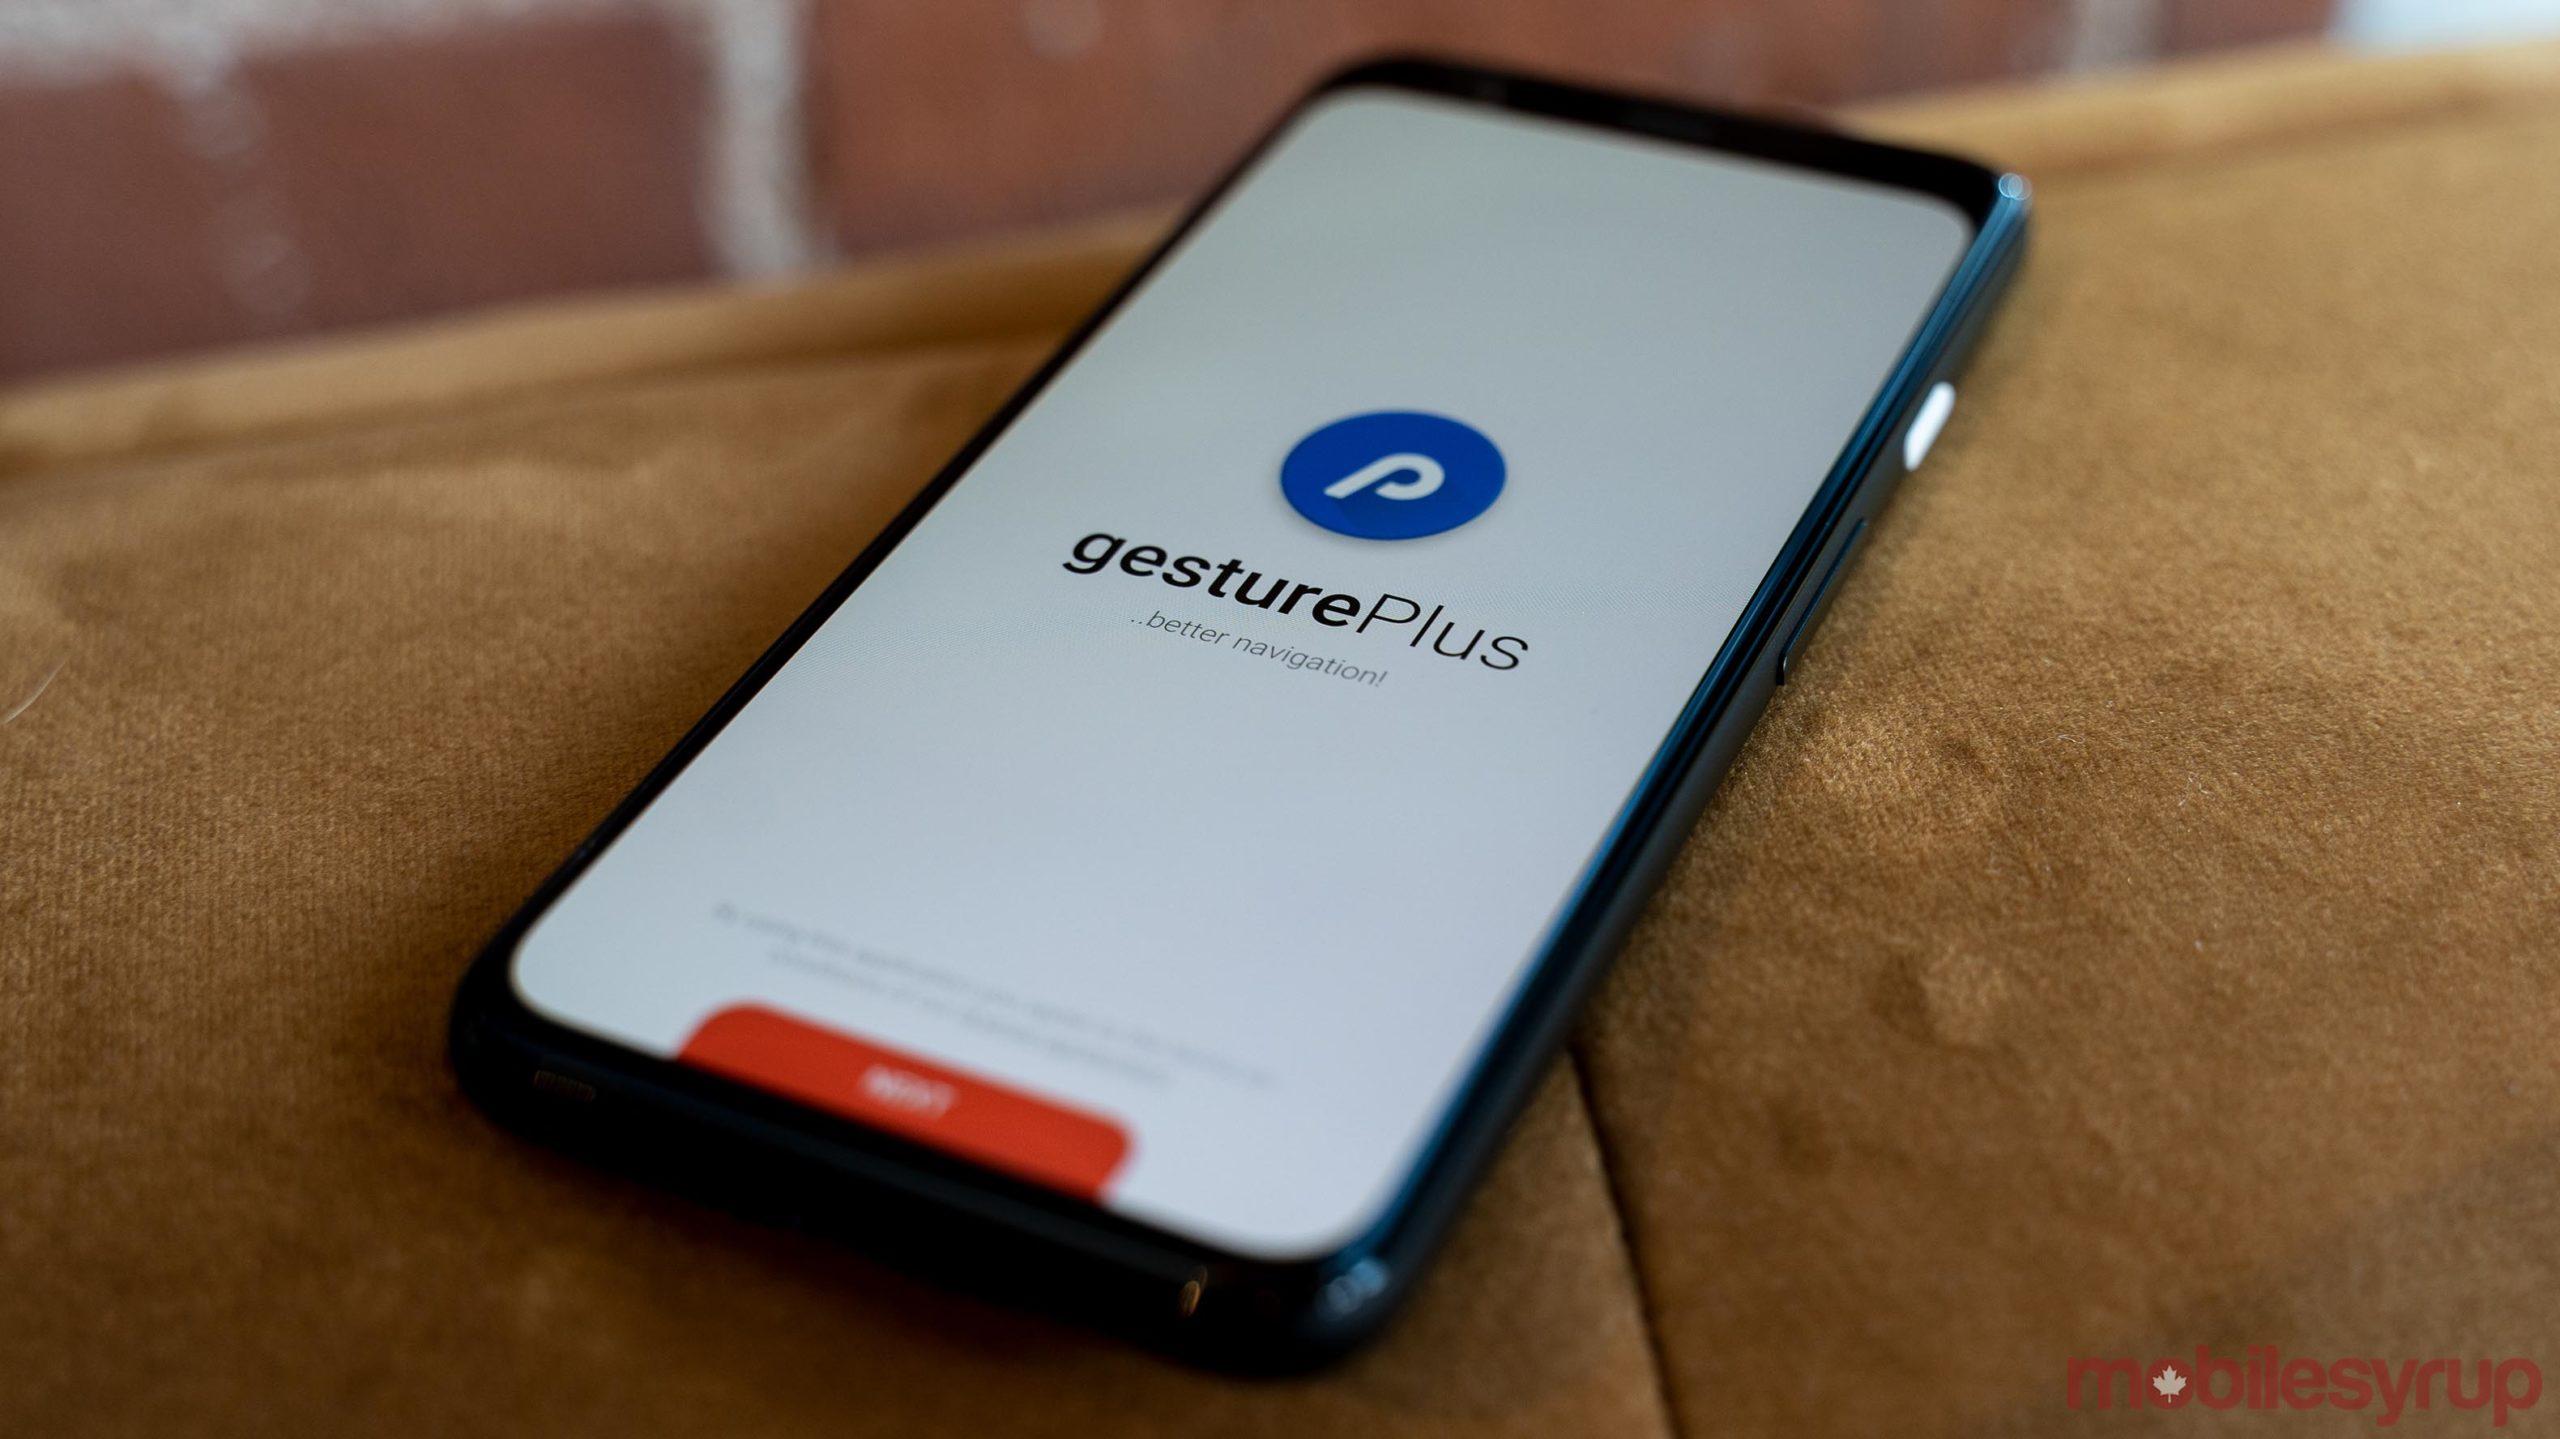 gesturePlus app header